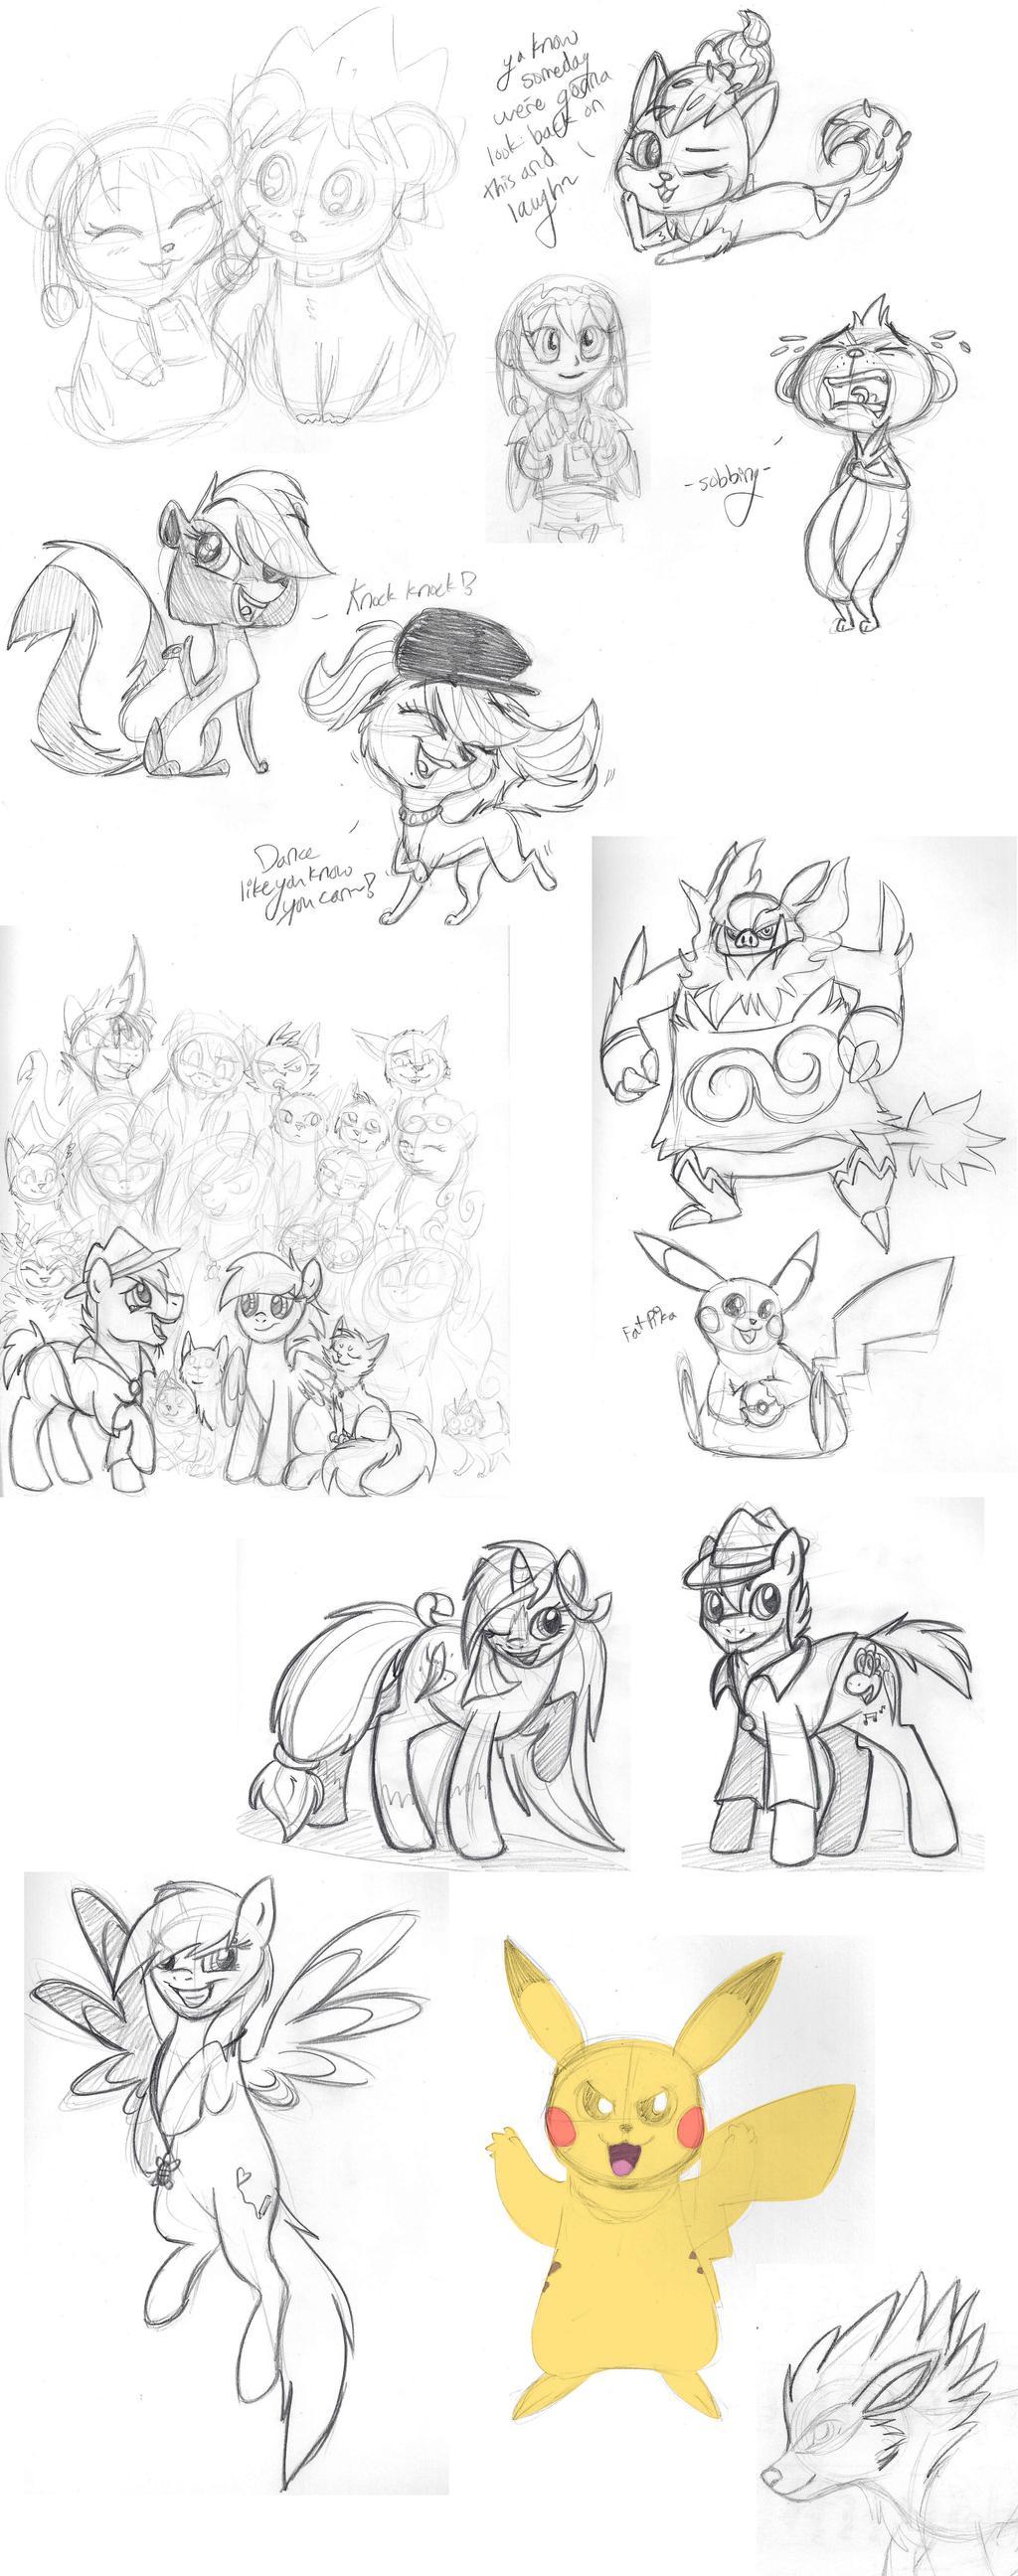 Summer Sketch Dump by TickleMeFrosty